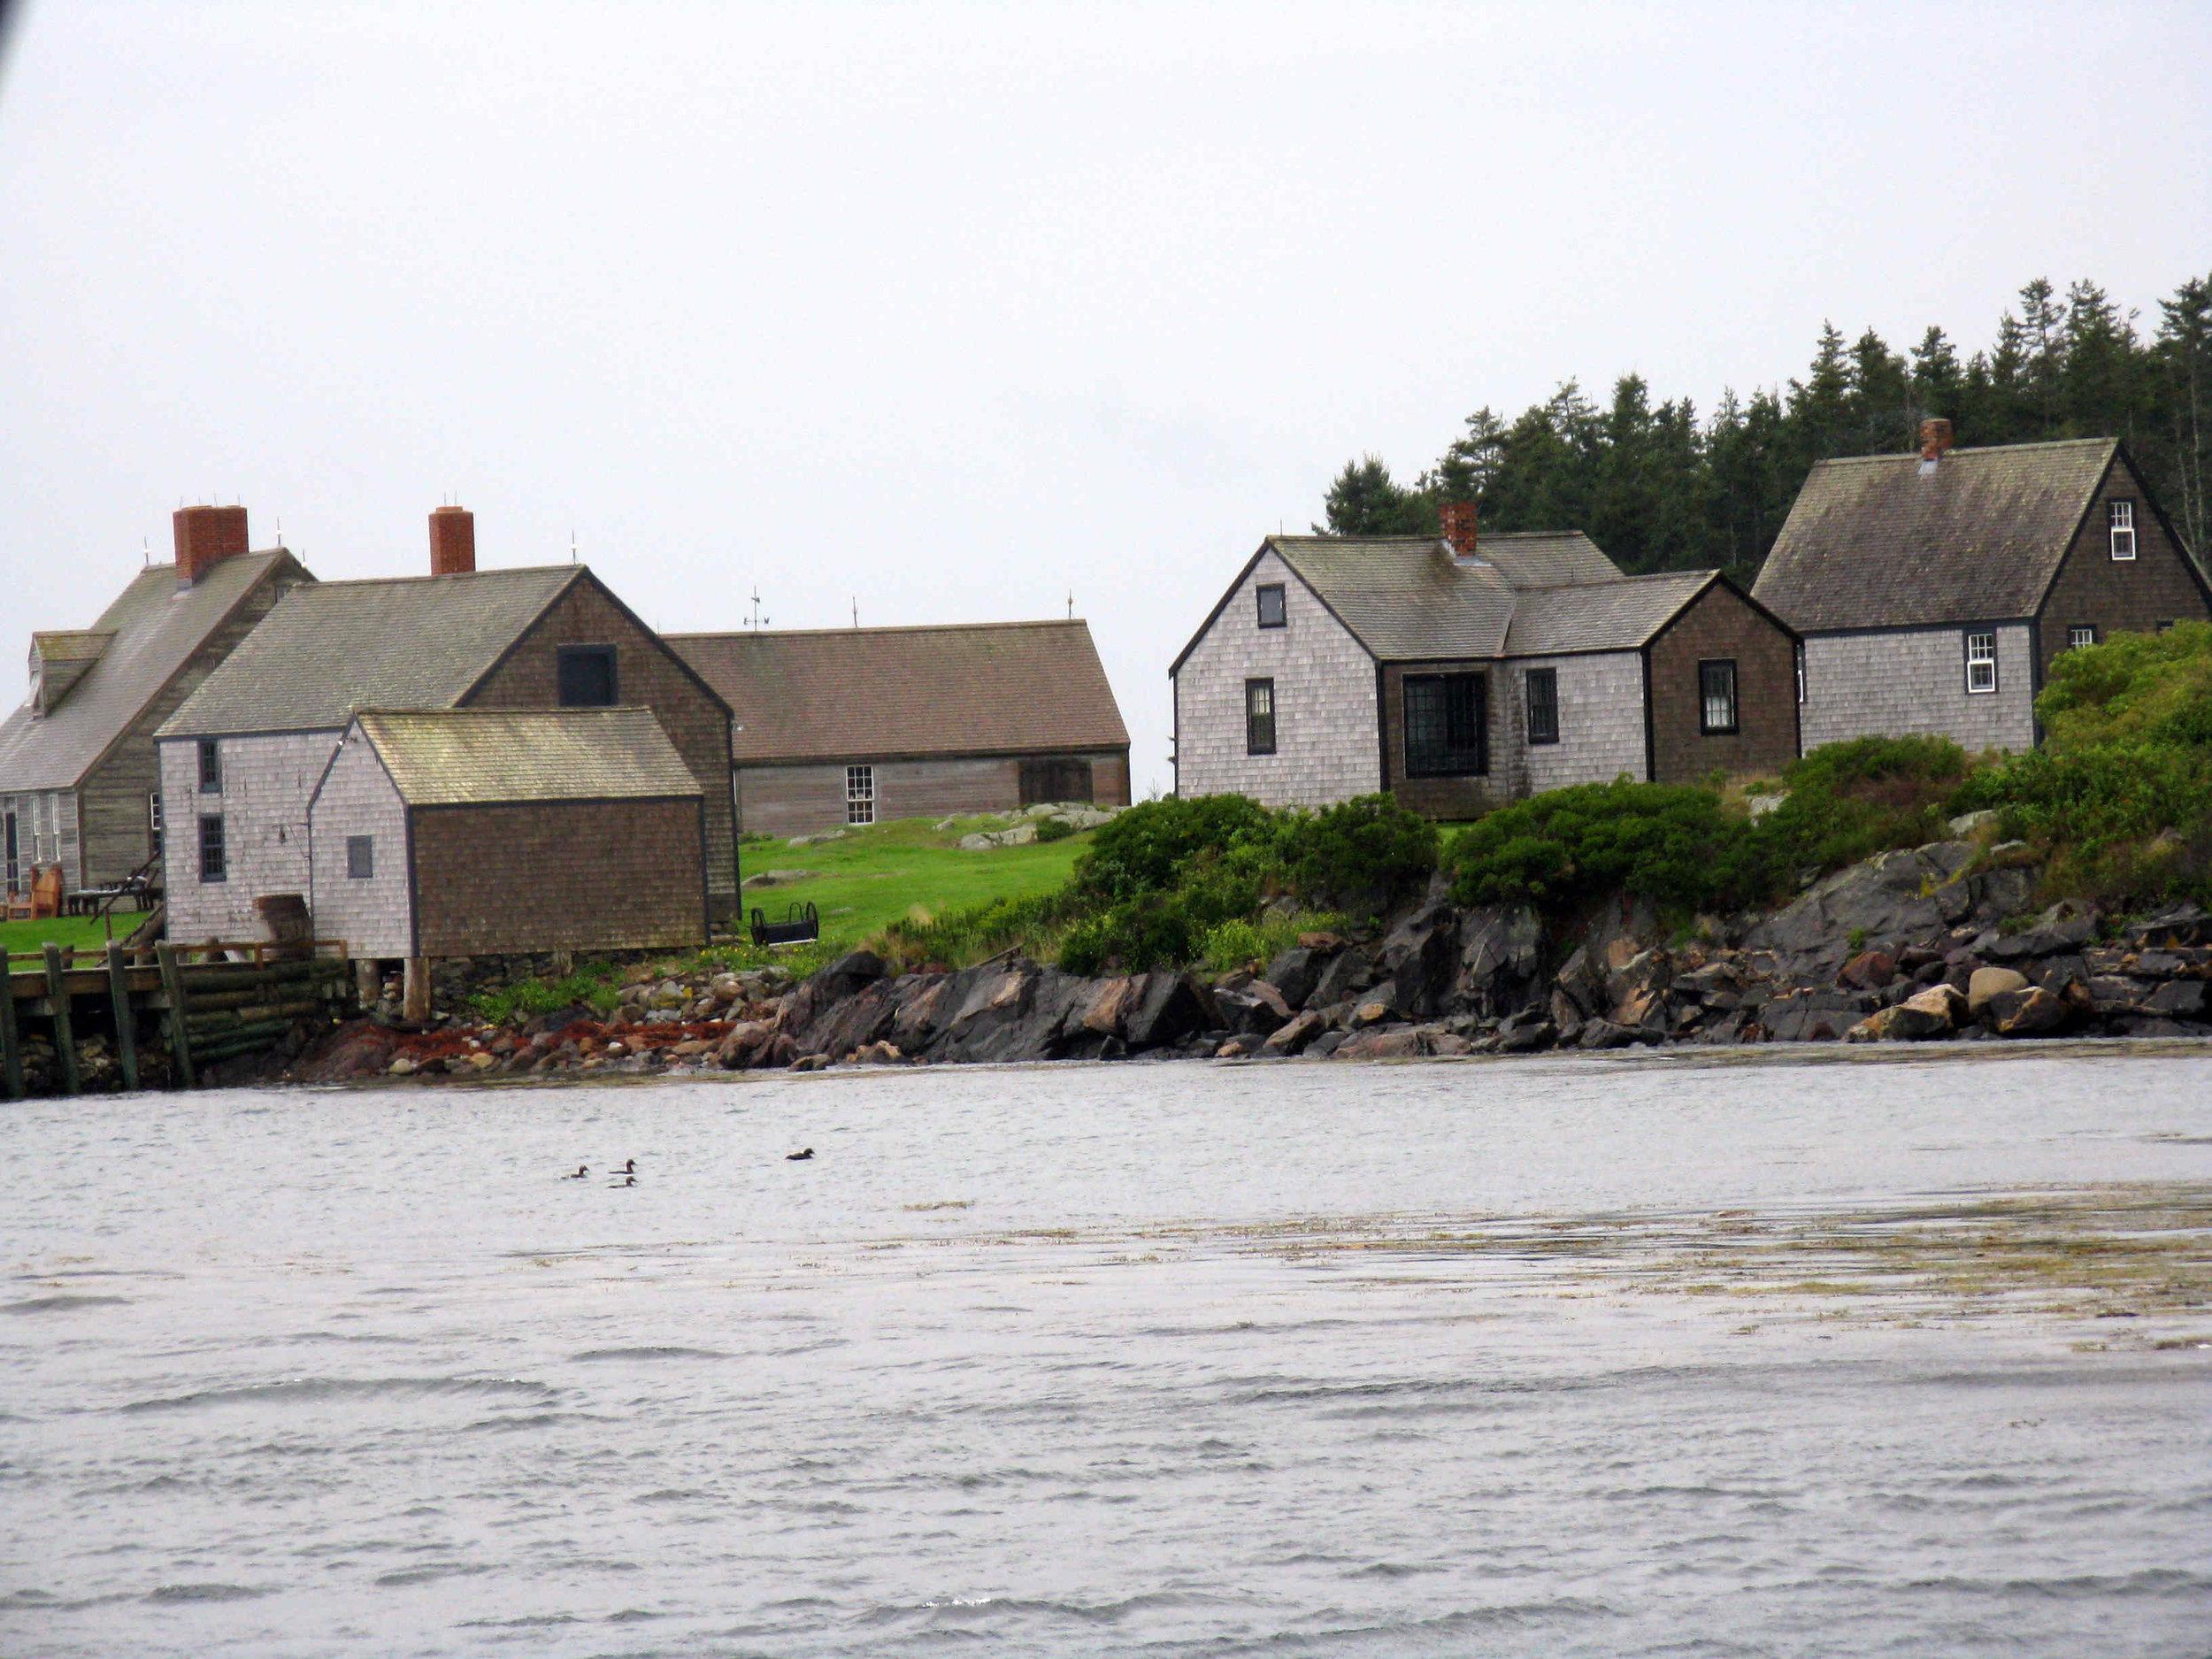 Houses on Maine lake